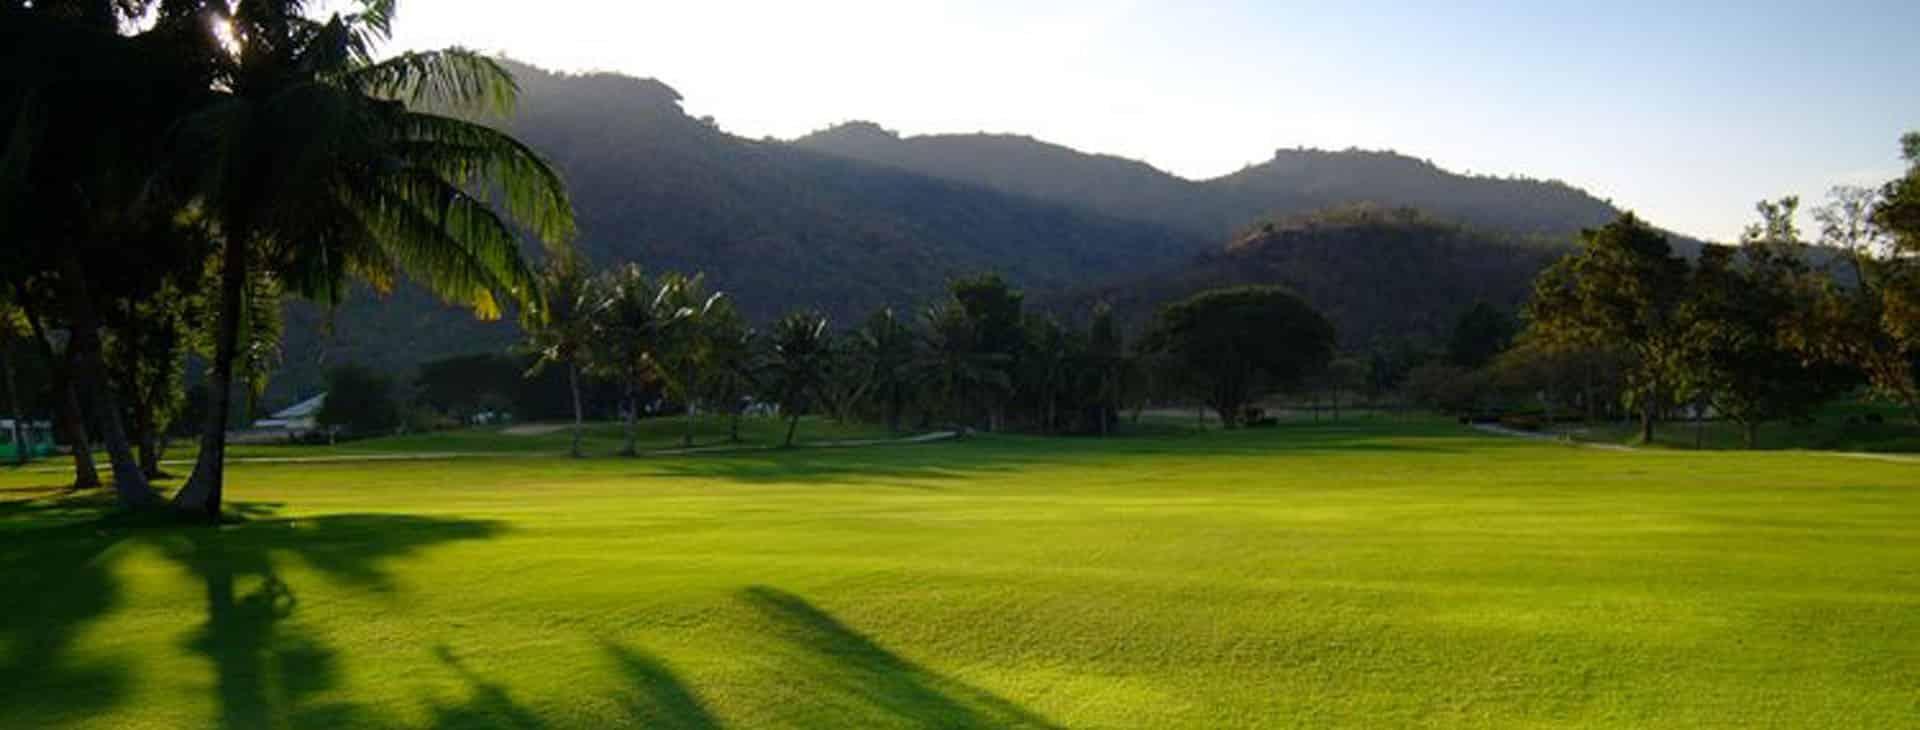 Golf-Thailand_Golf-Courses_Hua-Hin_Palm-Hills-Golf-Course